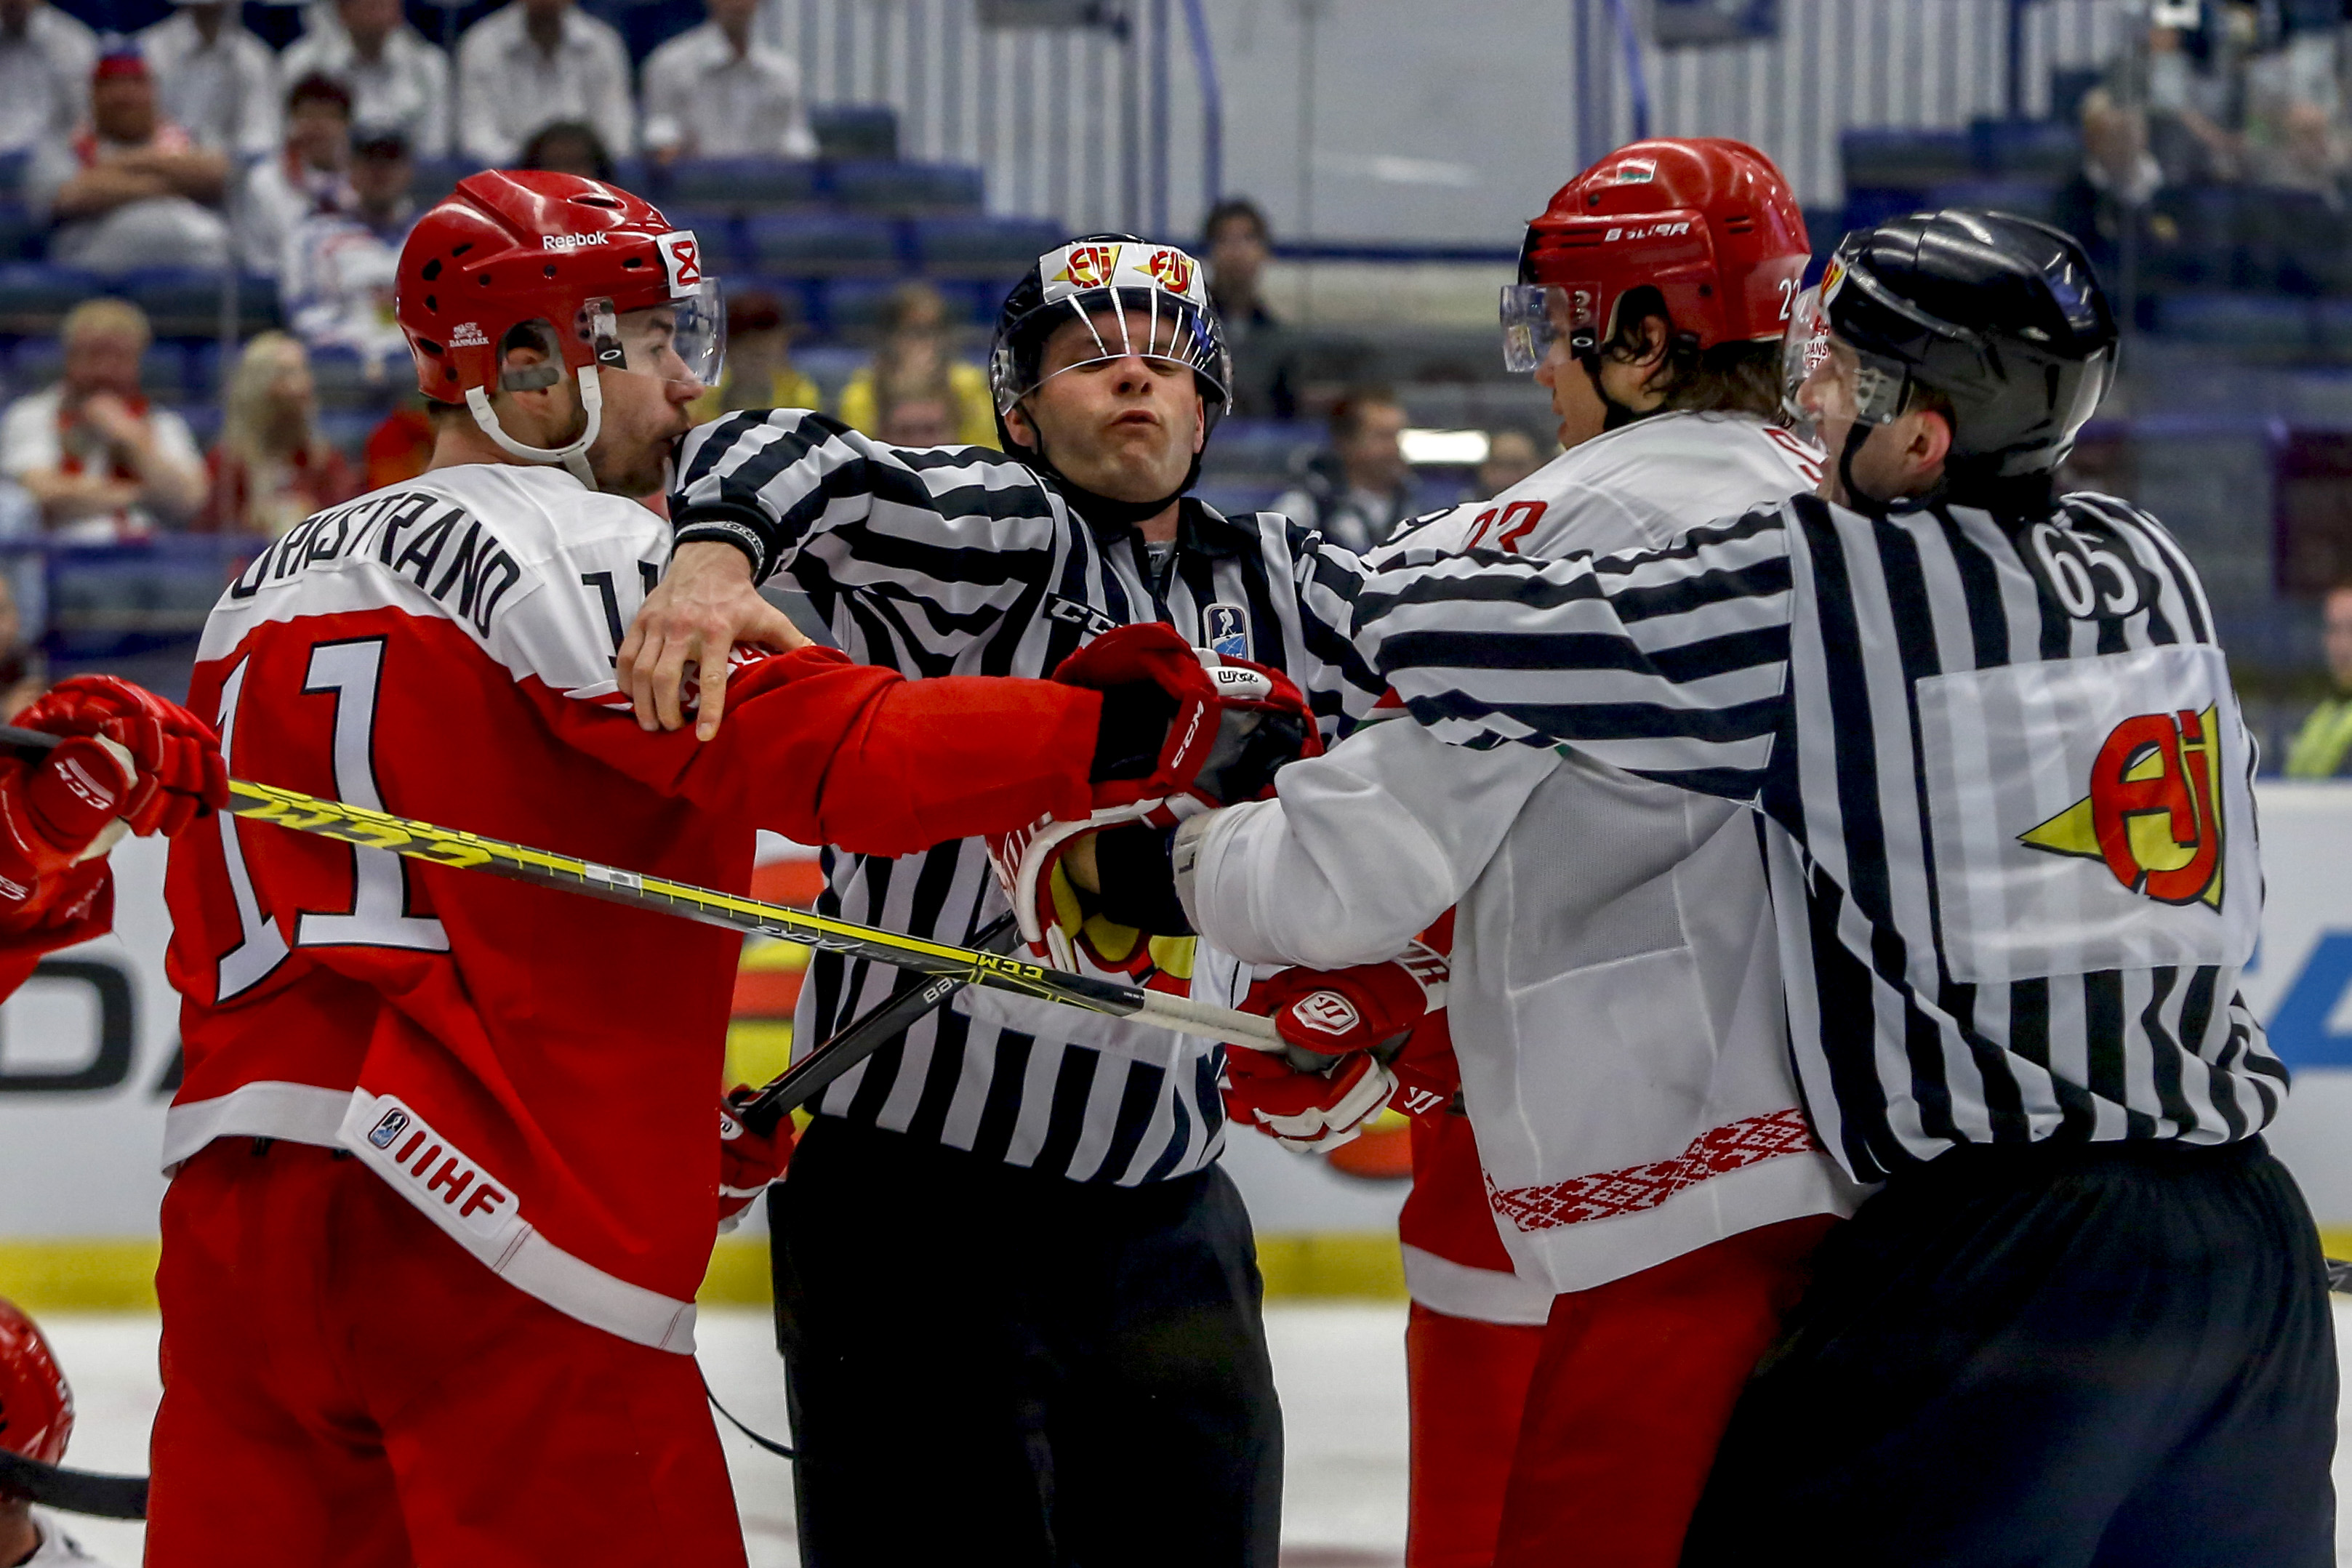 Denmark v Belarus - 2015 IIHF Ice Hockey World Championship